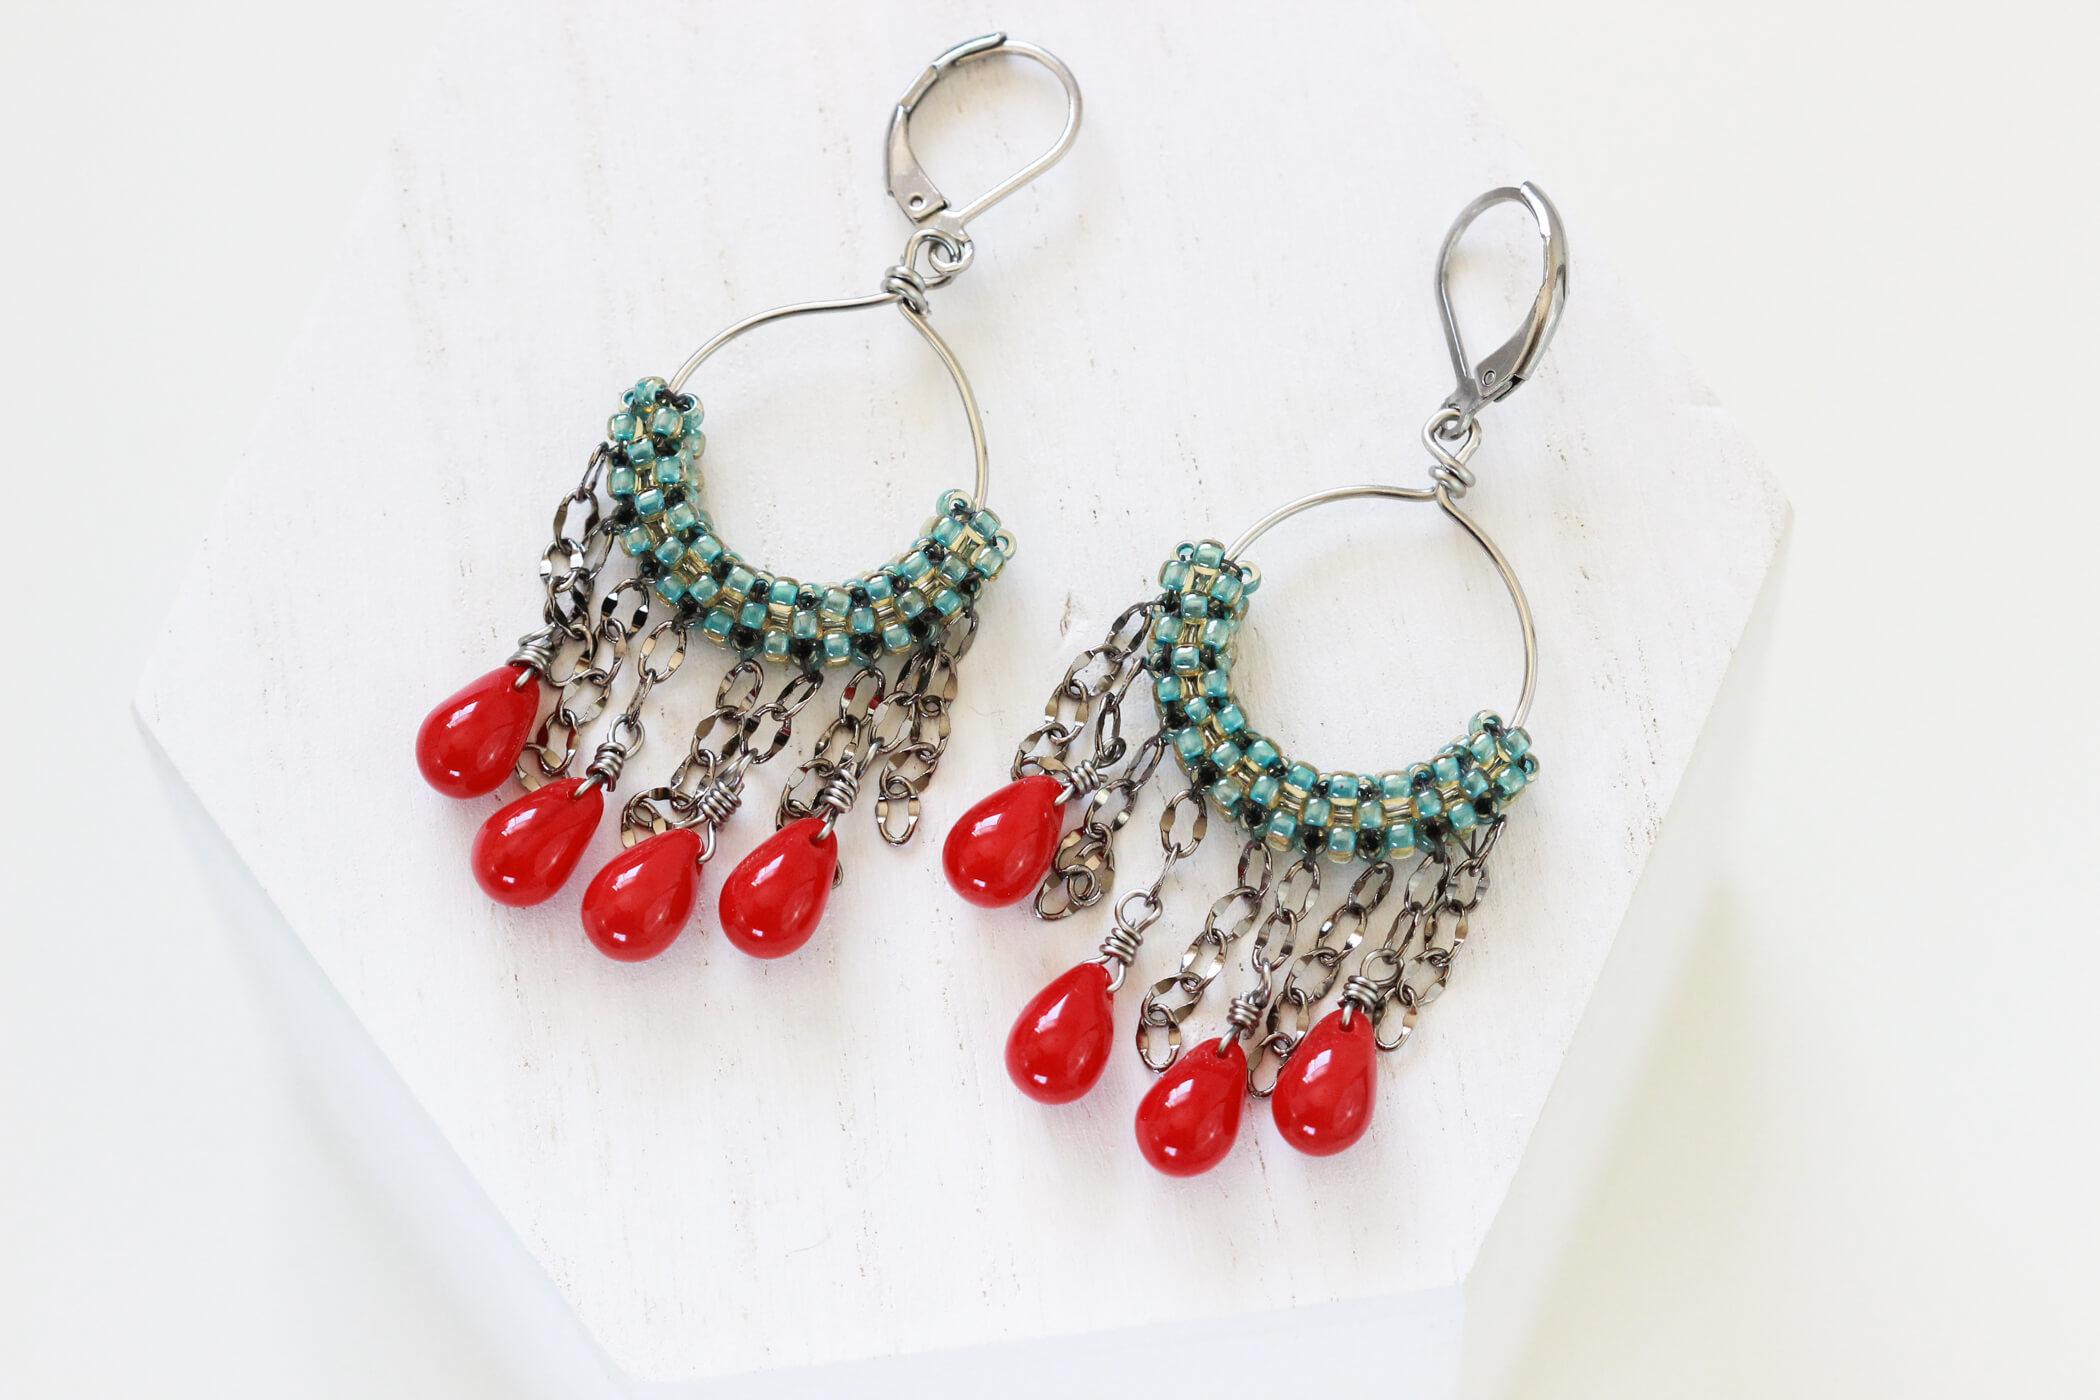 Green Beaded Earrings – Green Hoop Earrings by Kaleidoscopes And Polka Dots